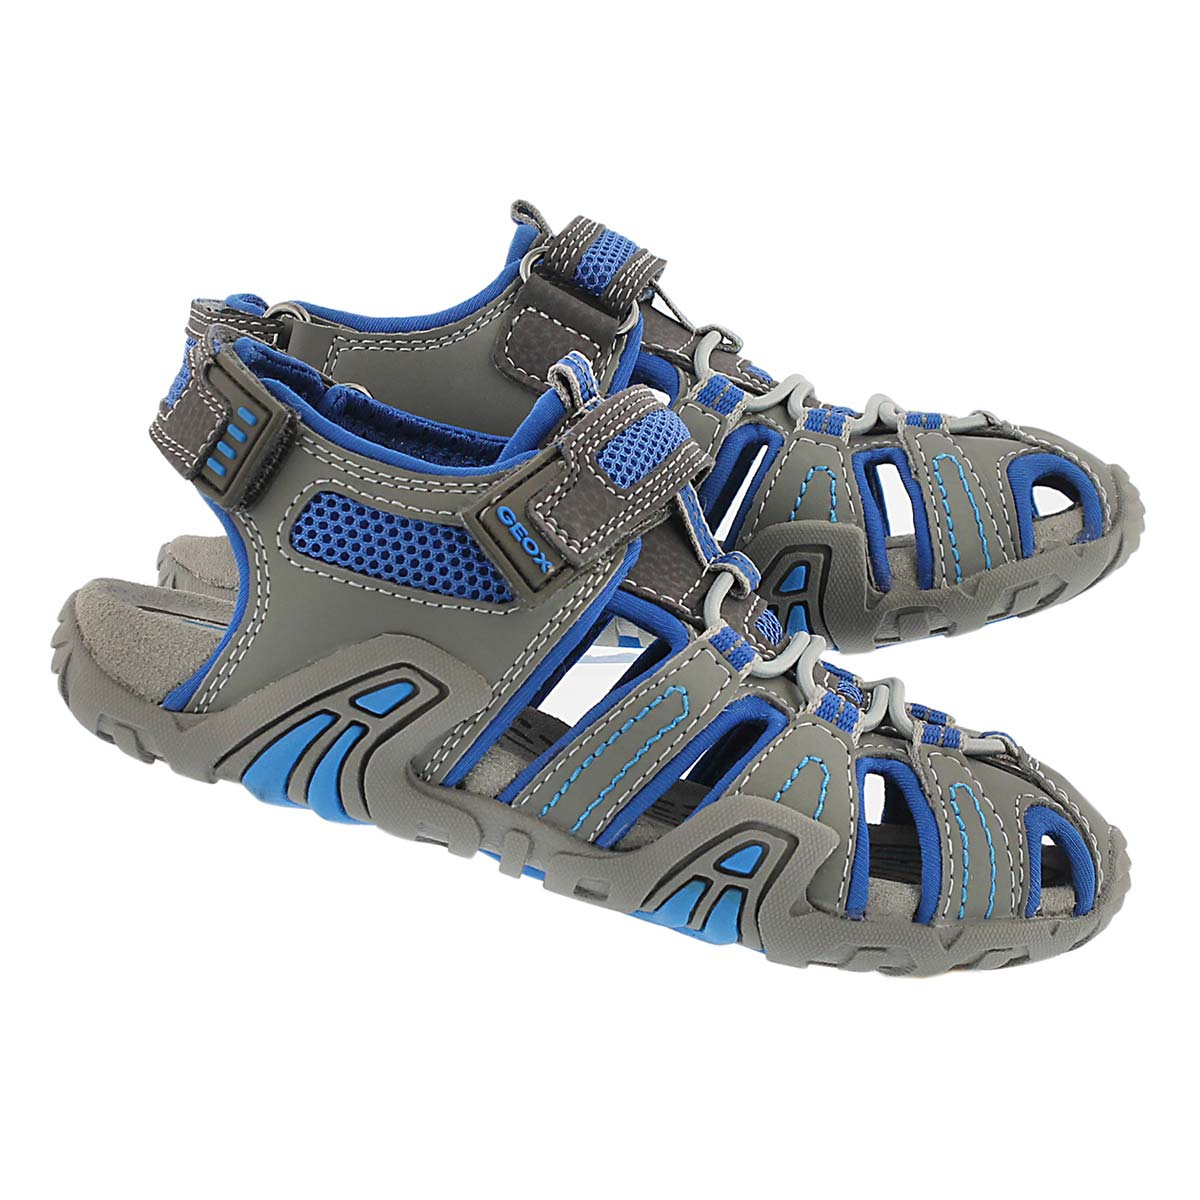 Sandale pêcheur KRAZE, gris/bleu, garçon